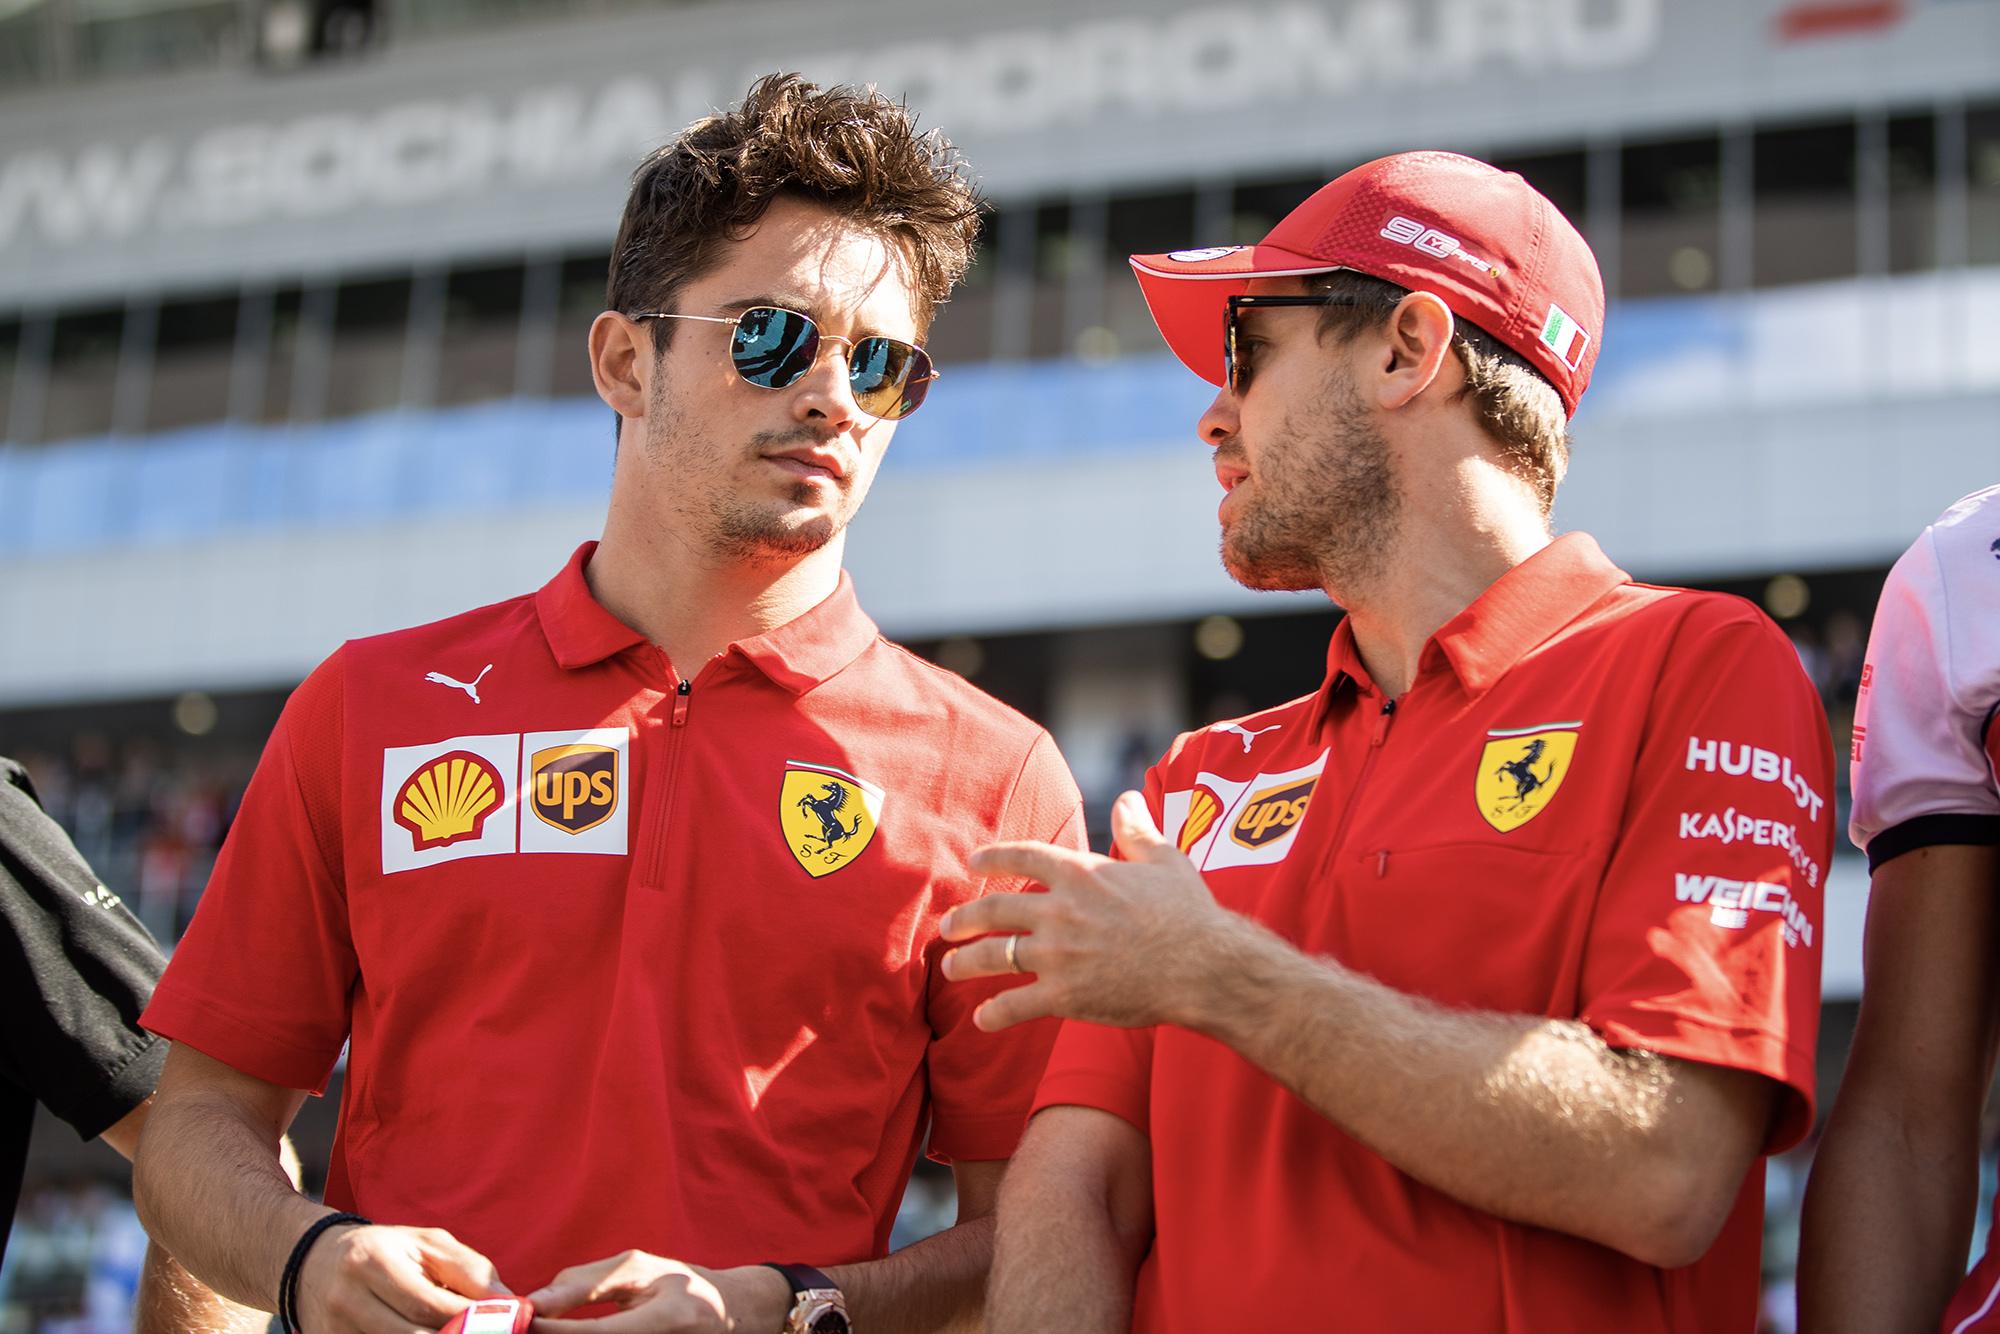 Charles Leclerc talks to Sebastian Vettel at the 2019 Russian Grand Prix